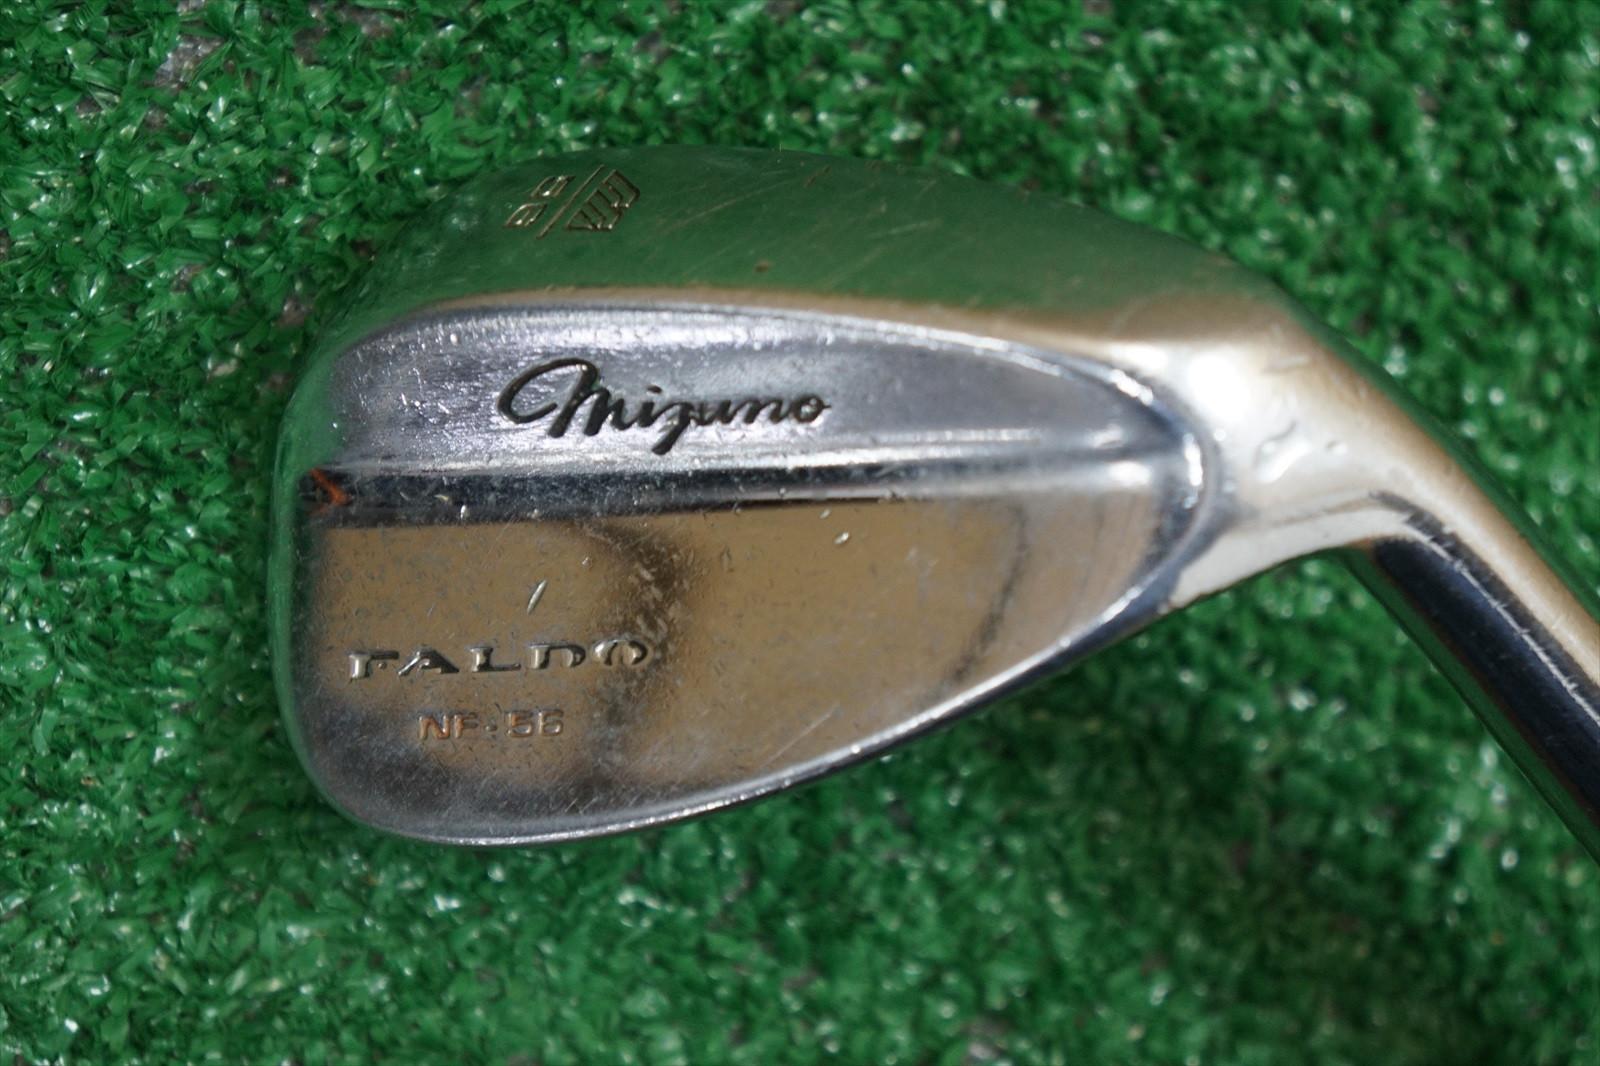 Mizuno Faldo ID Golf Club